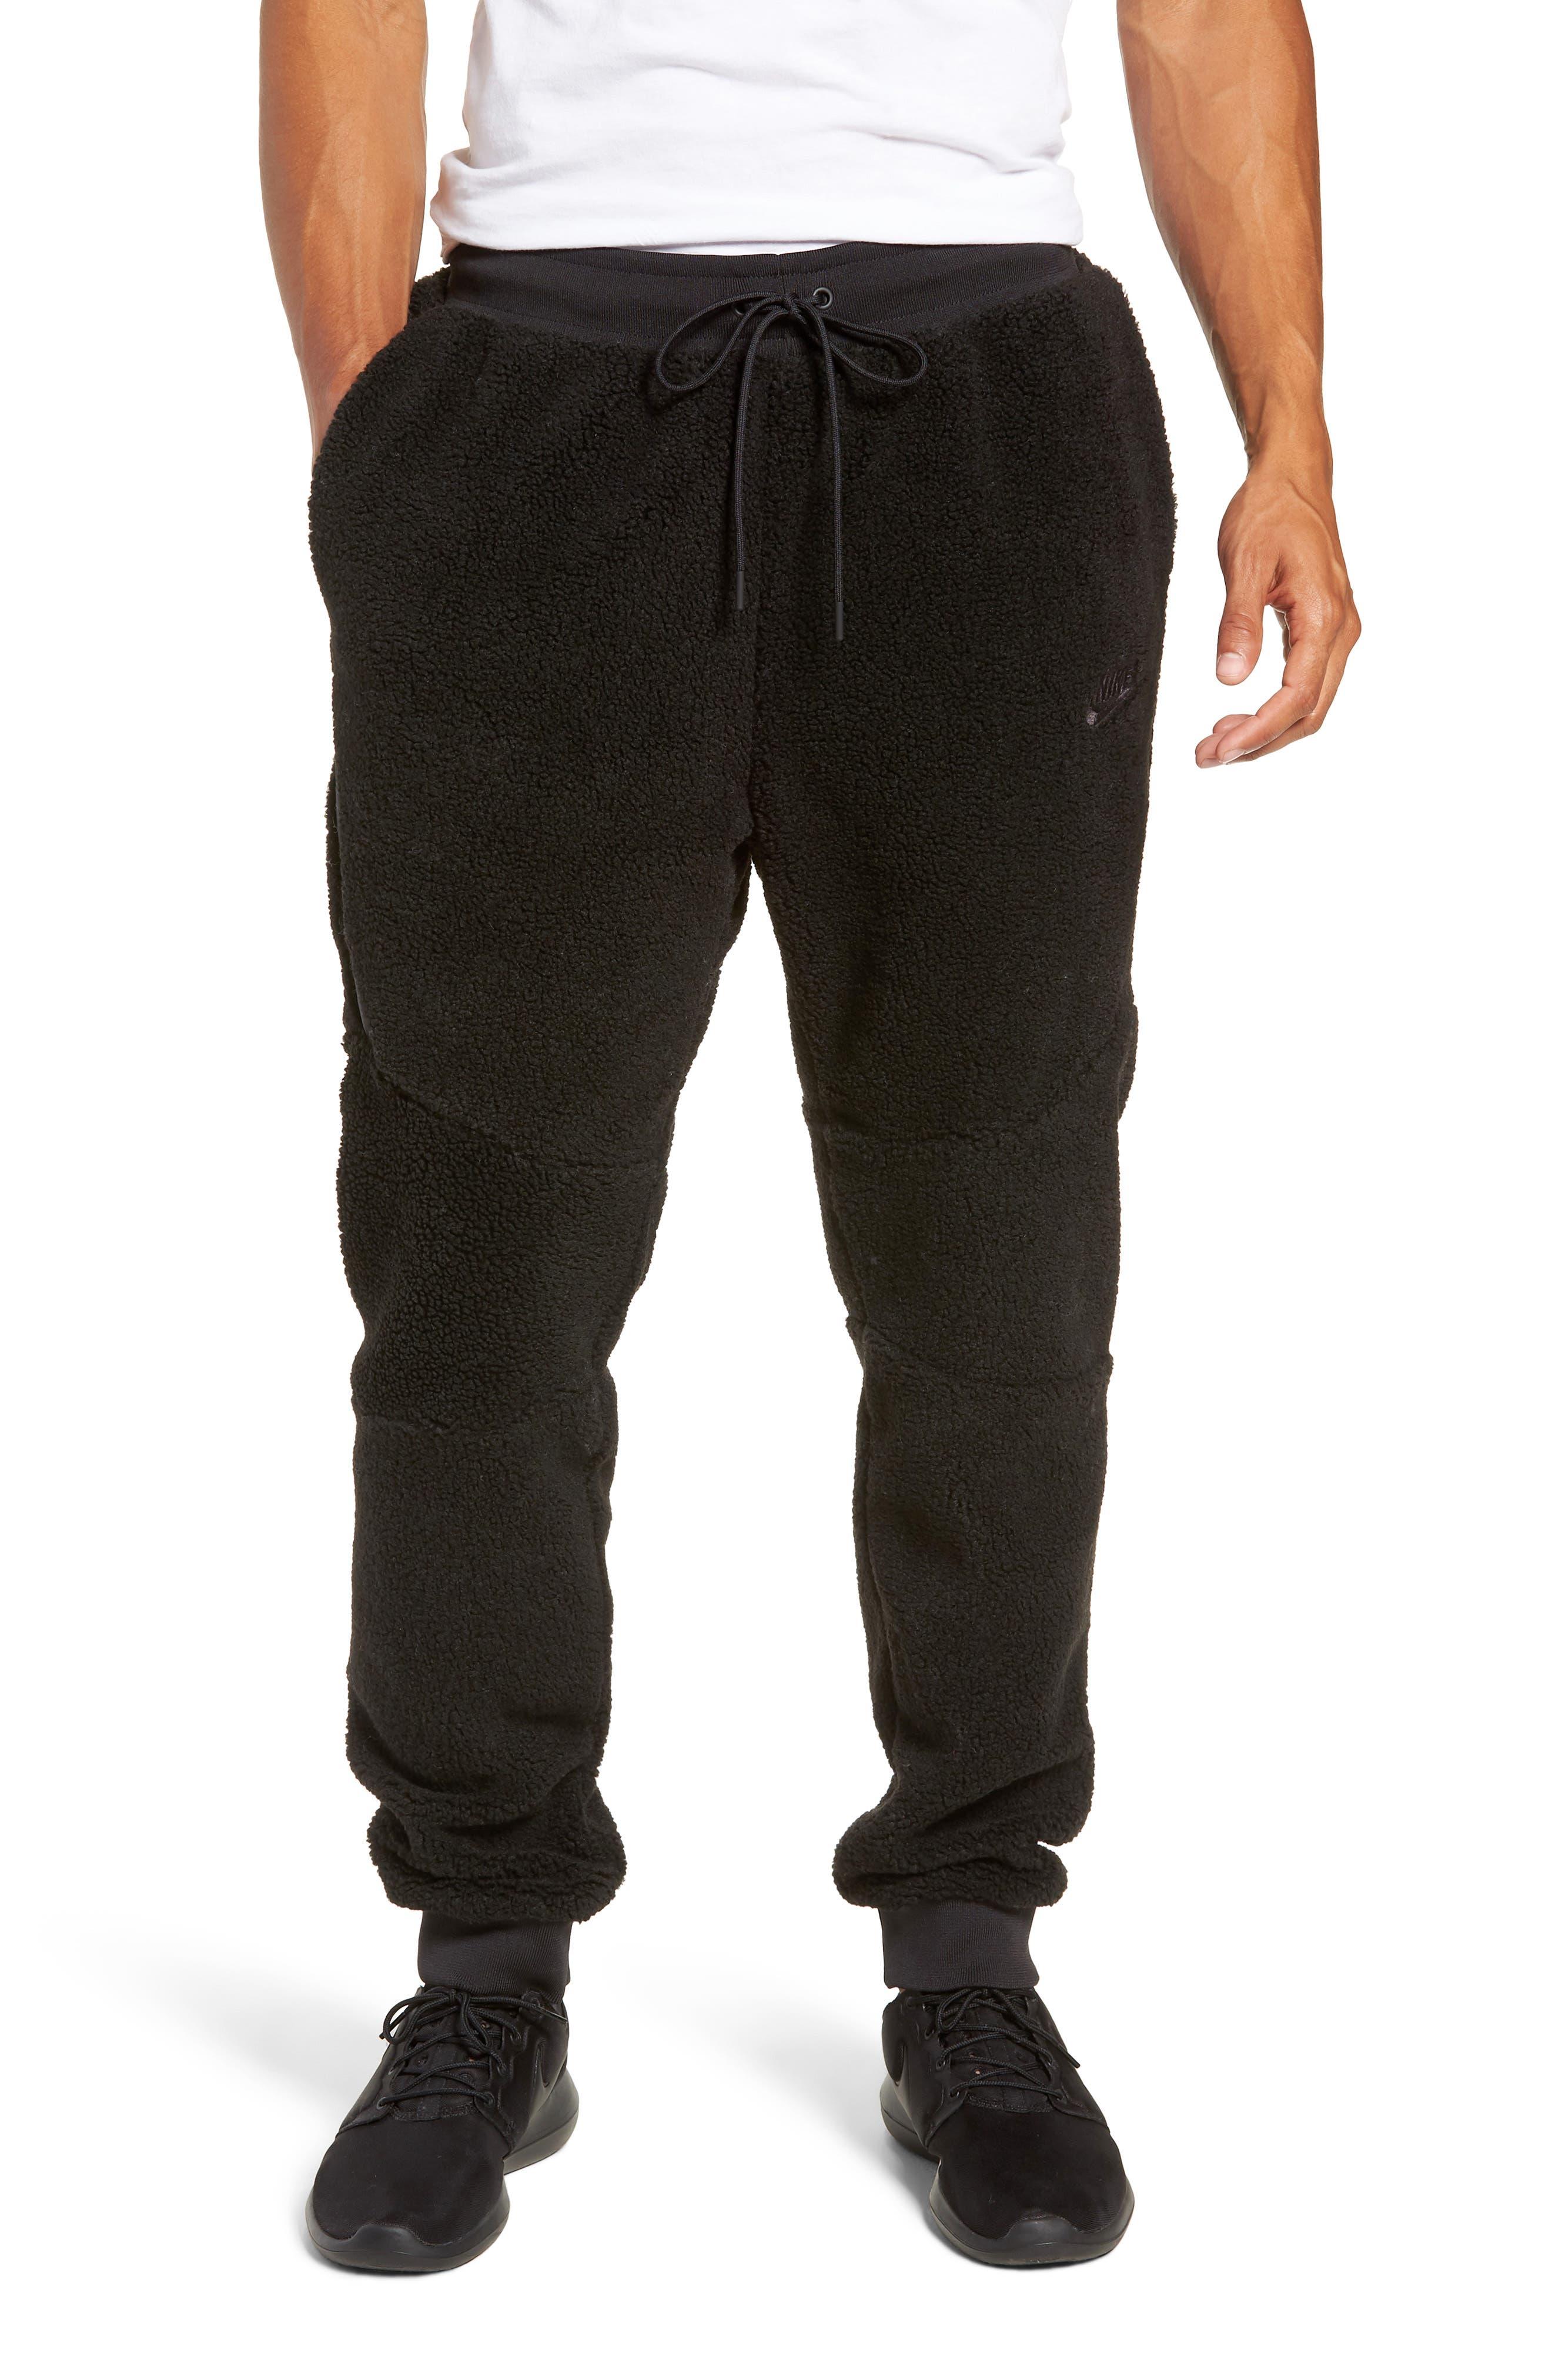 NIKE Sportswear Tech Fleece Icon Jogger Pants, Main, color, 010